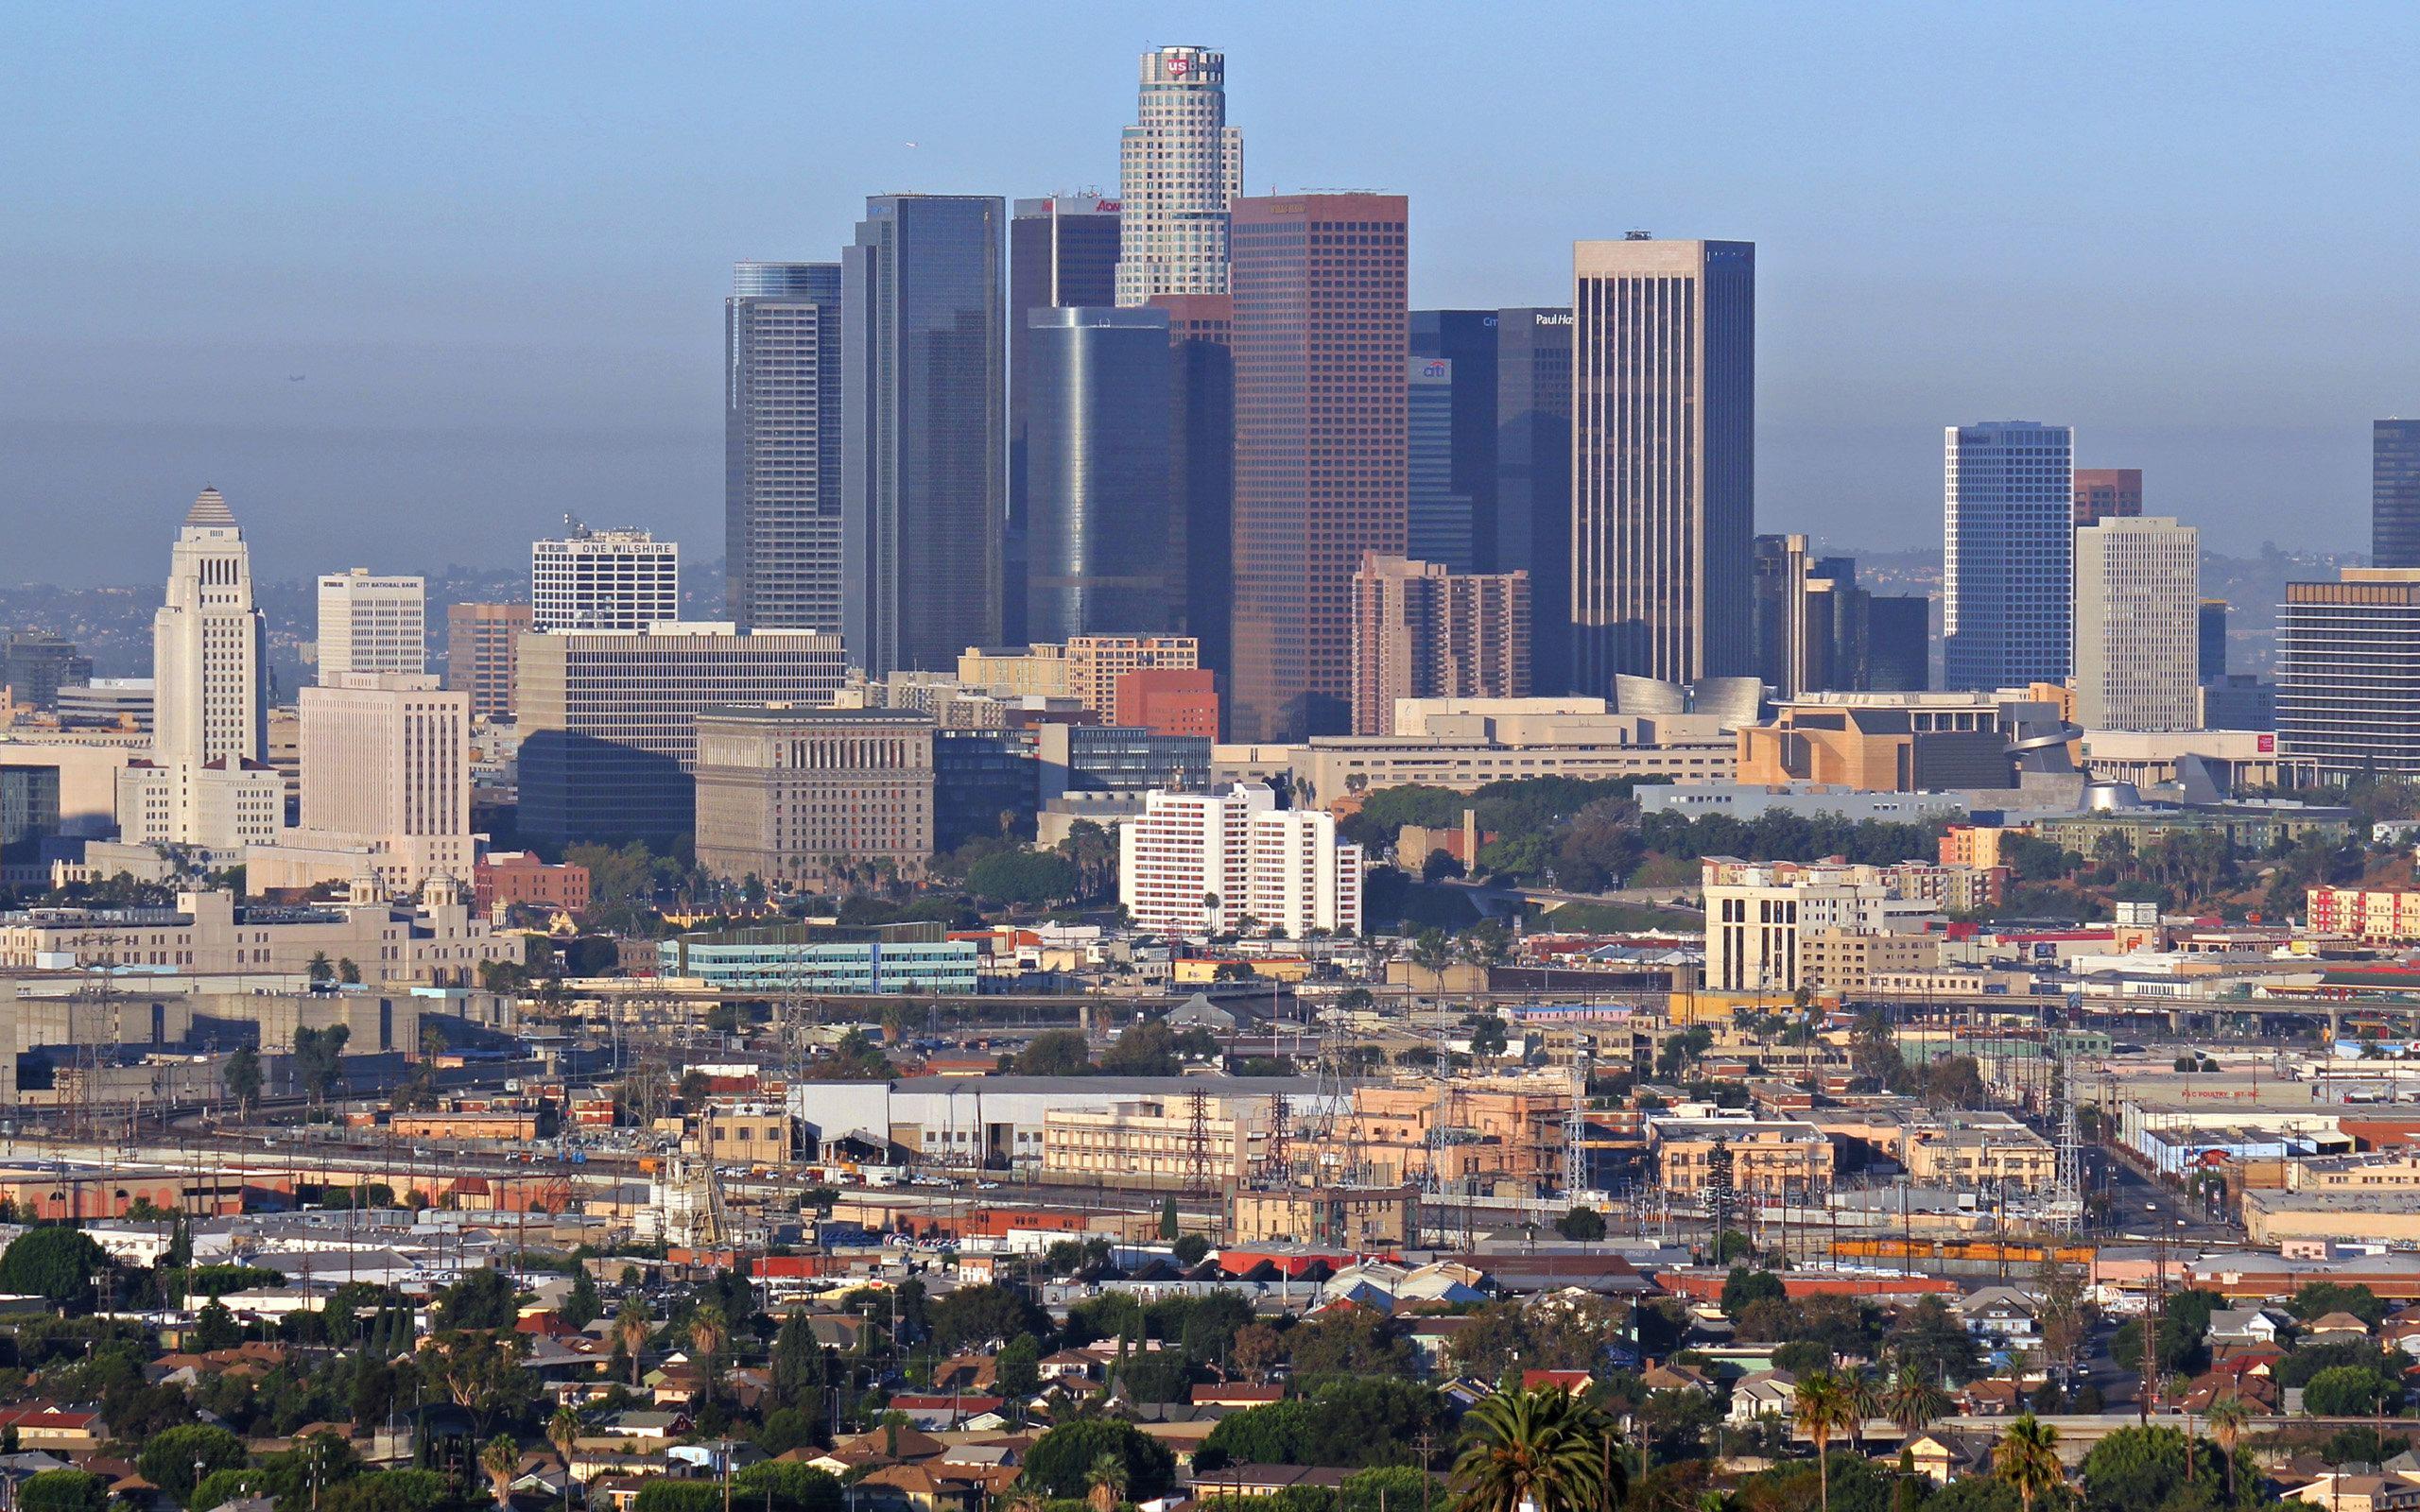 Los Angeles Downtown Skyline Los Angeles Fond D Ecran